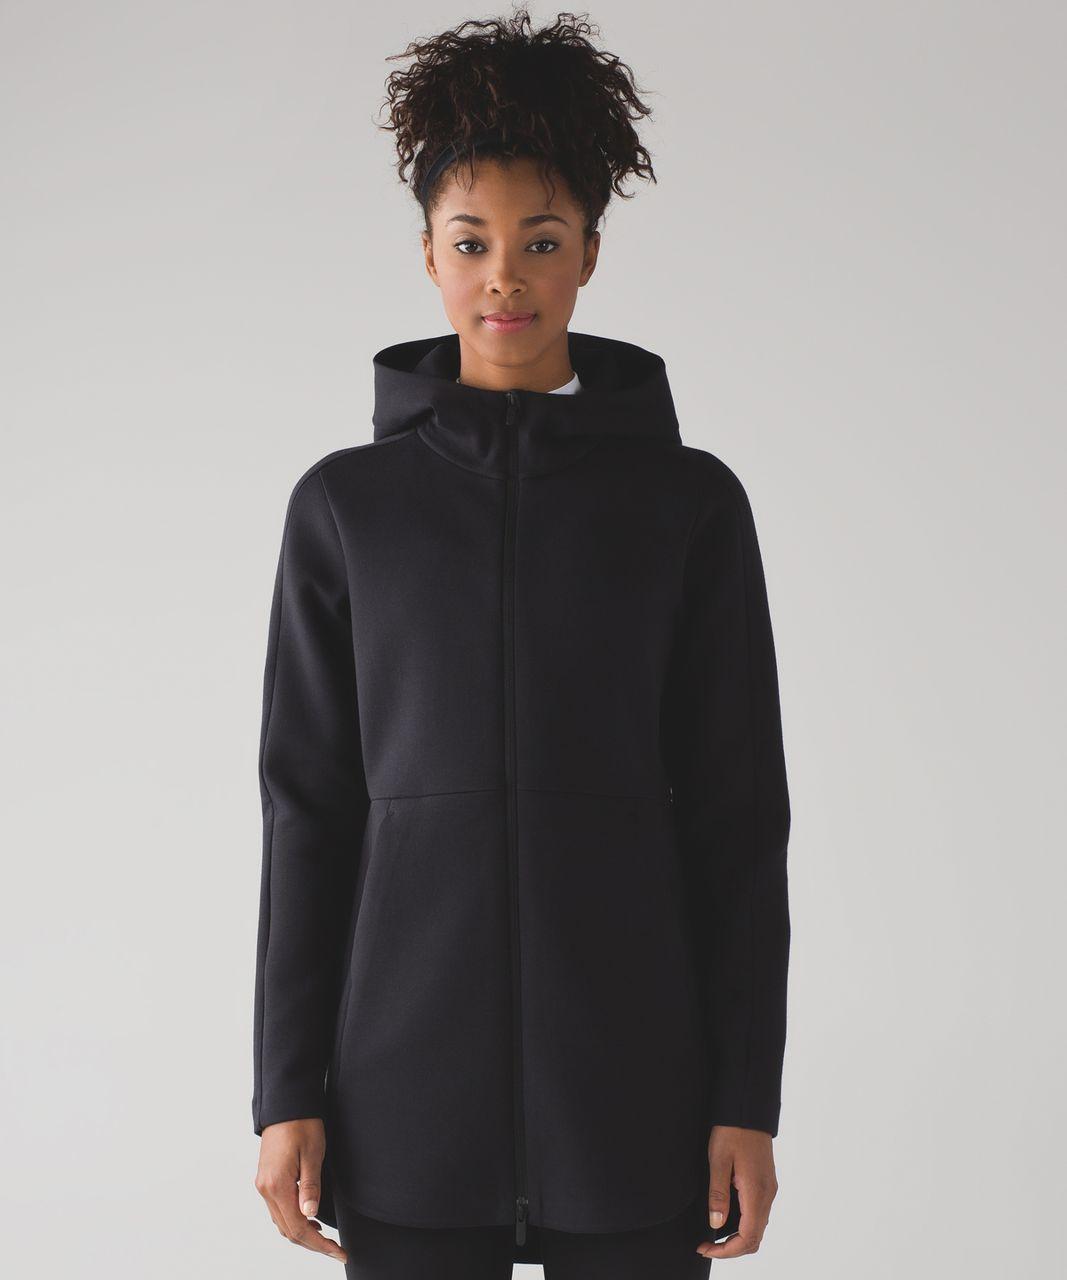 Lululemon Going Places Hooded Jacket Black Lulu Fanatics Jackets For Women Hooded Jacket Jackets [ 1280 x 1067 Pixel ]